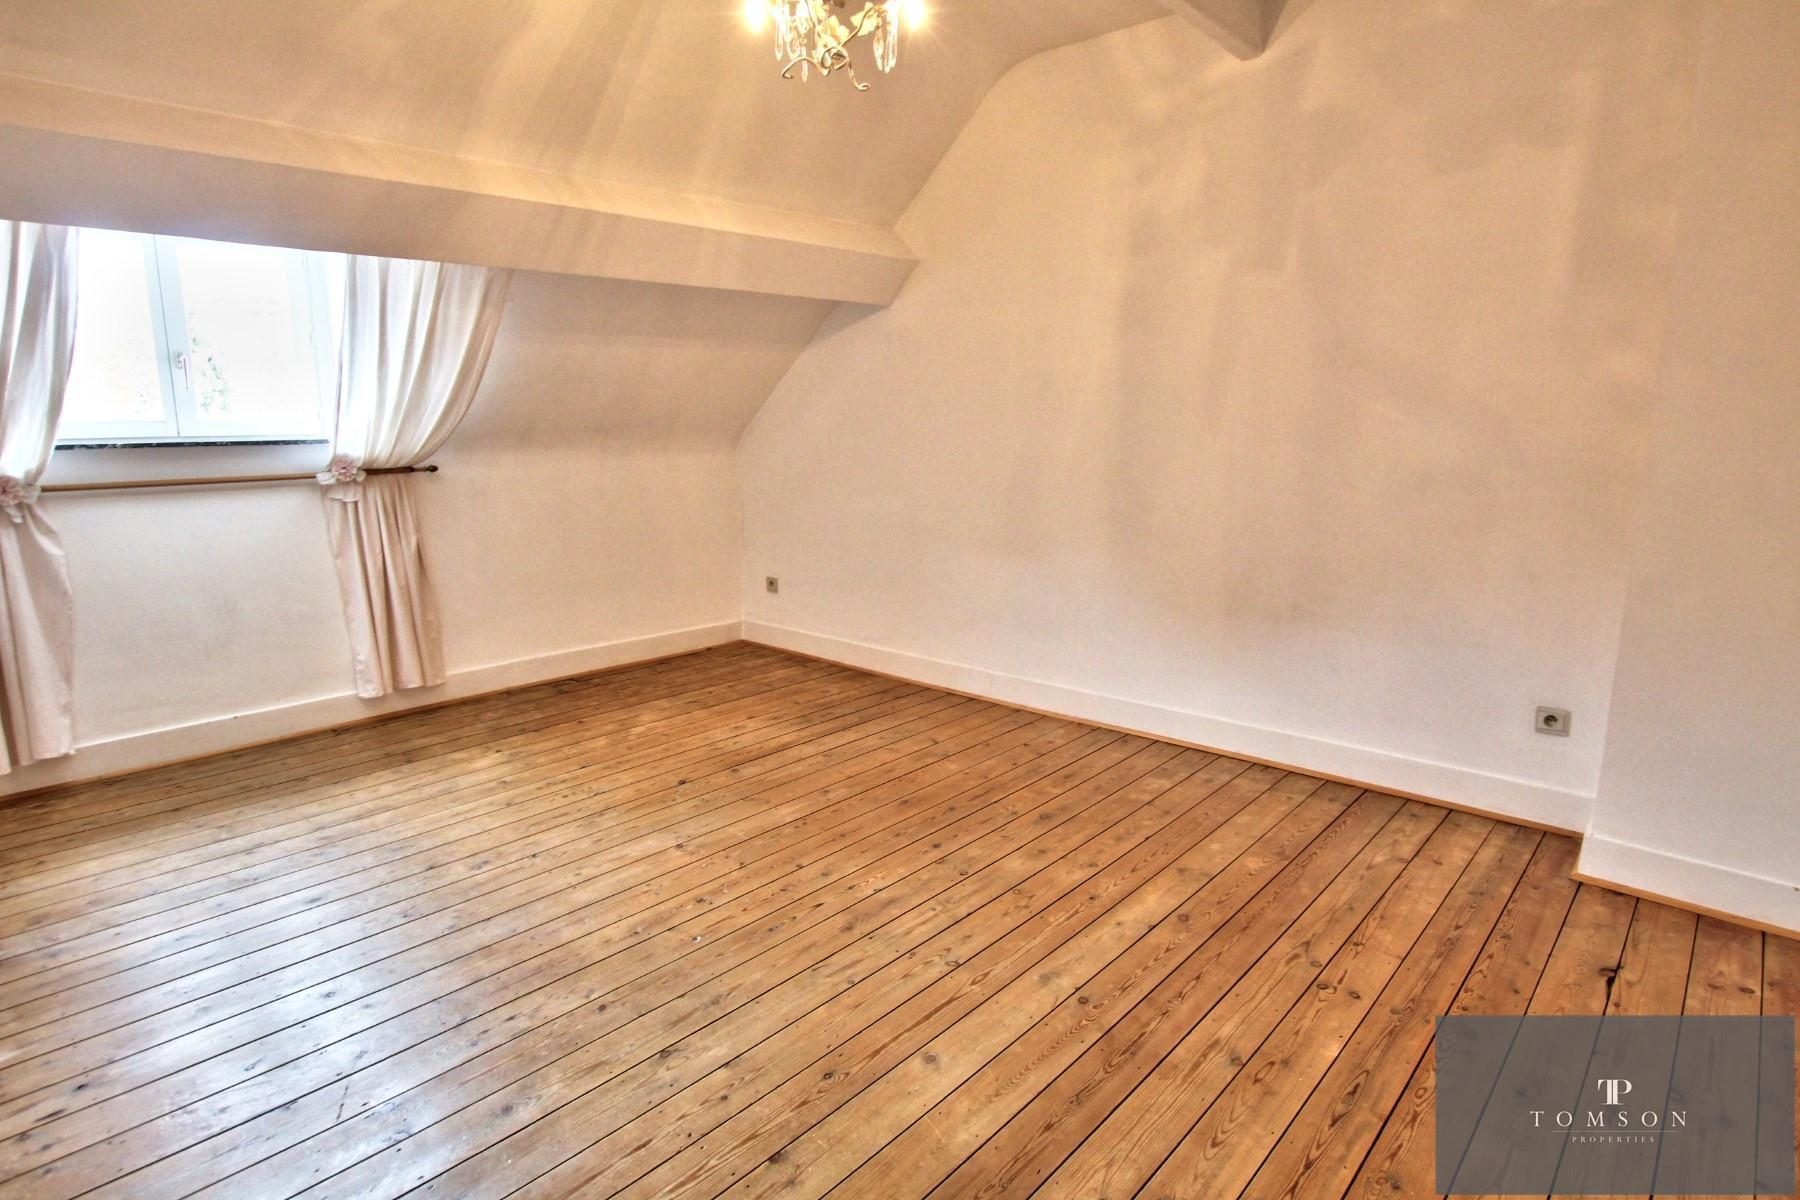 House - Etterbeek - #4246787-7